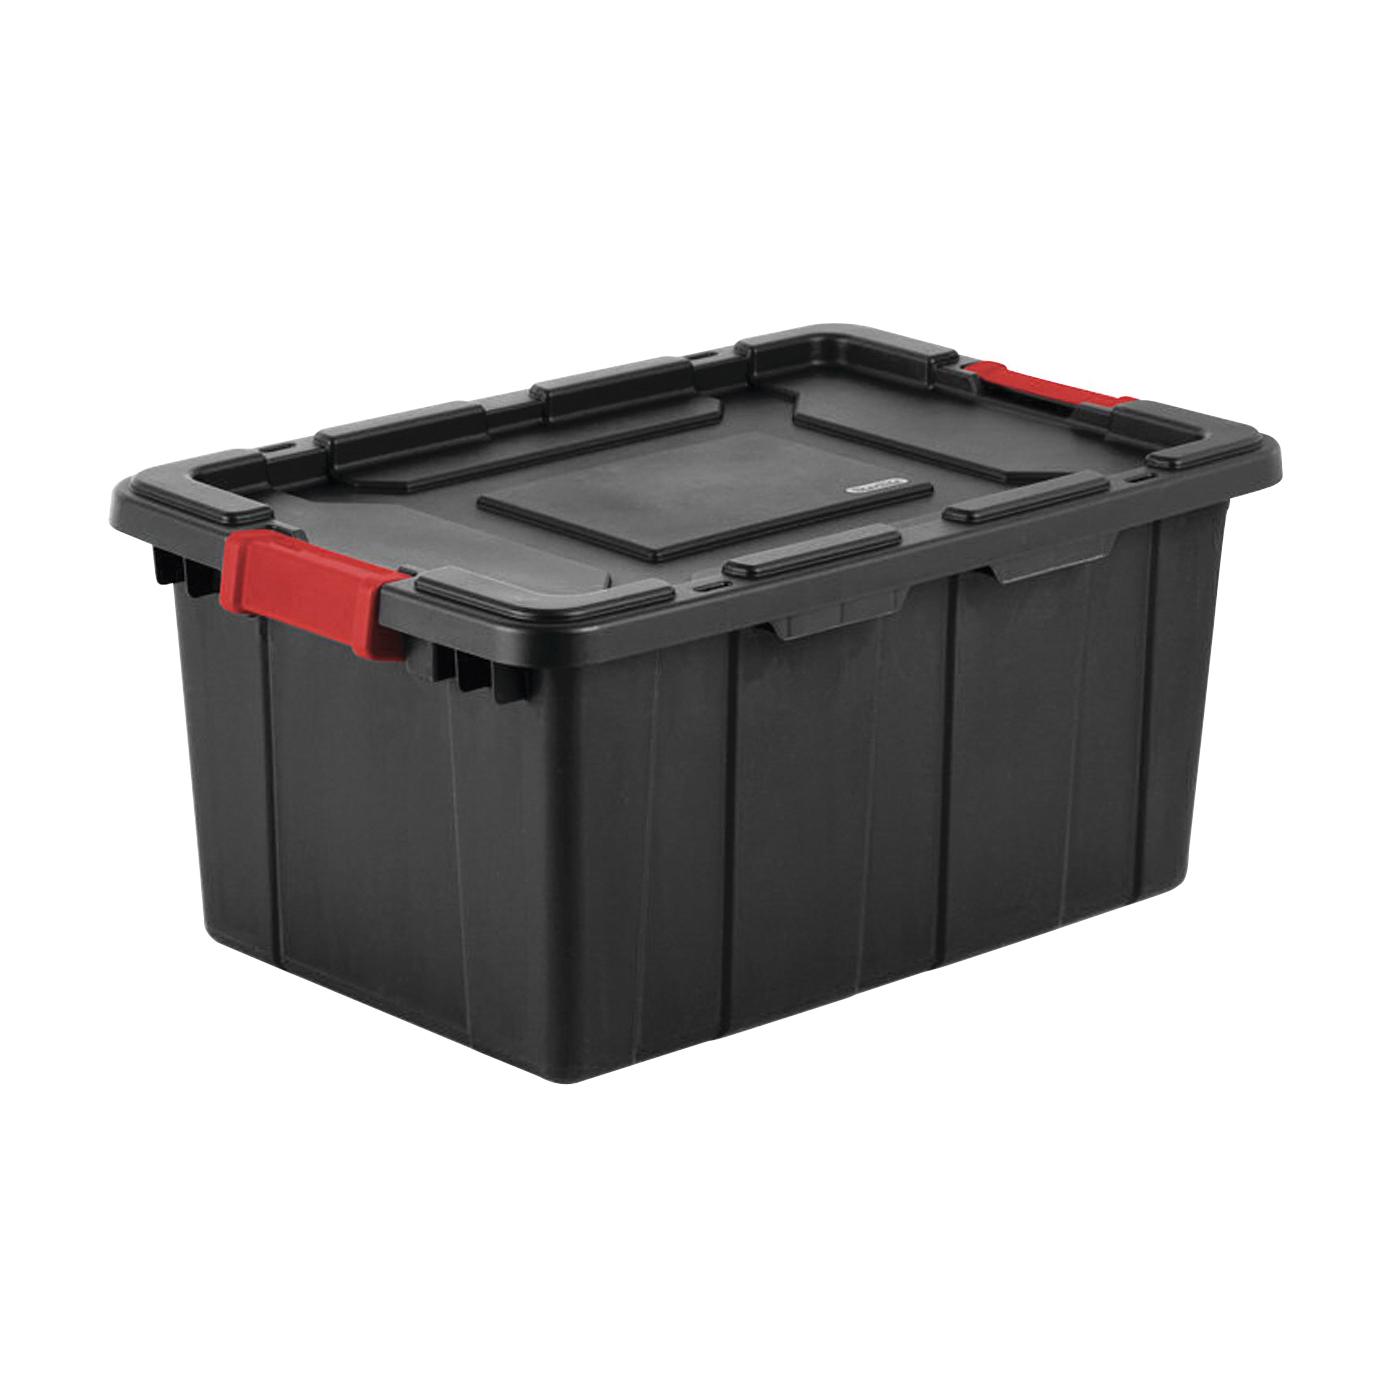 Picture of Sterilite 14649006 Industrial Tote, Plastic, Black, 25-3/4 in L, 17-1/4 in W, 11-7/8 in H